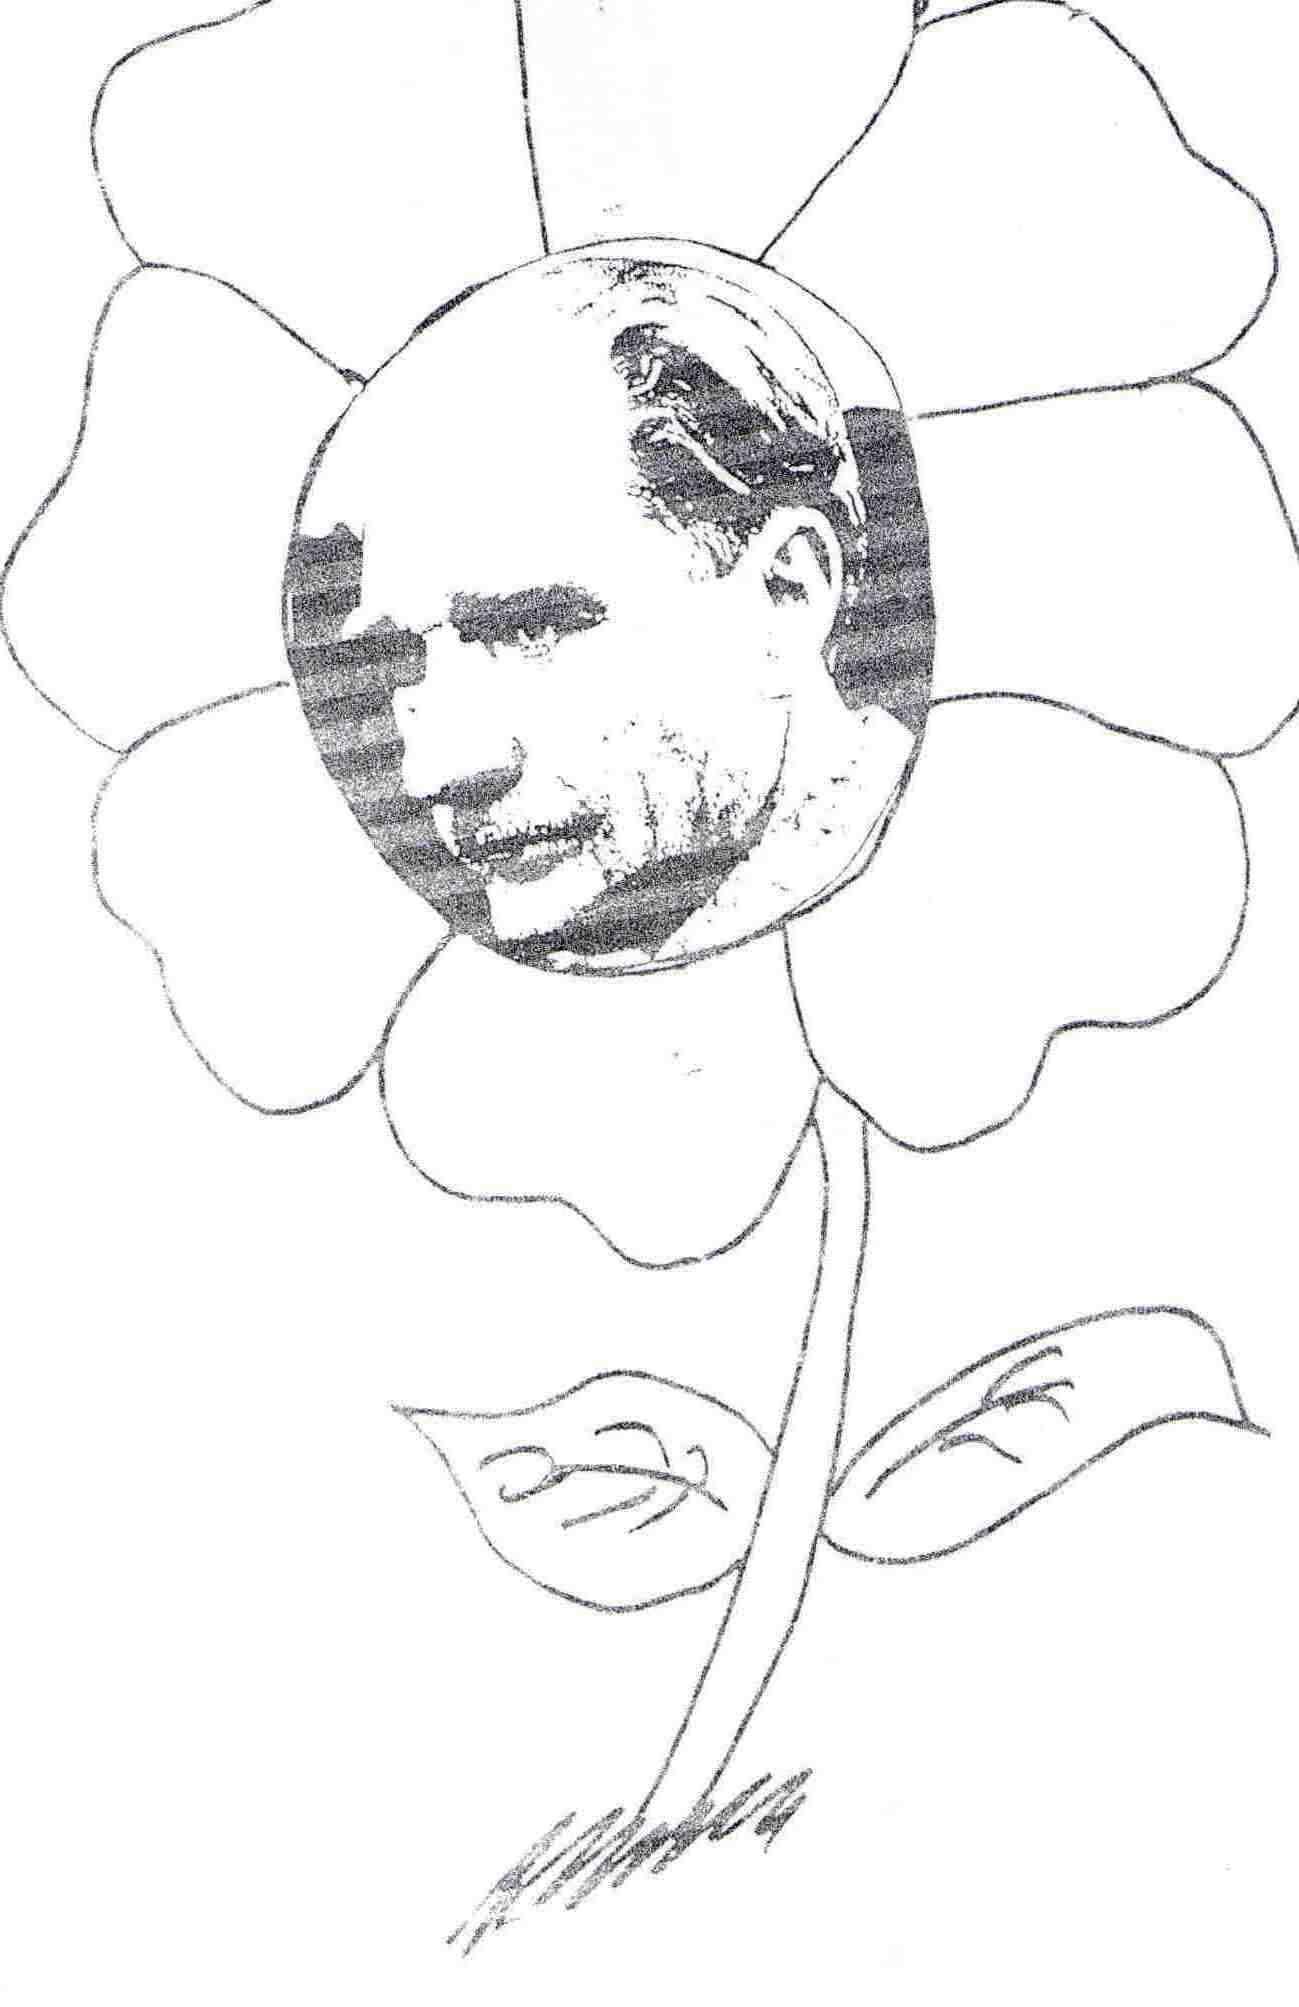 Ataturk Ataturkboyama Boyama 10kasimboyama Resim Boyama Sayfalari Sanat